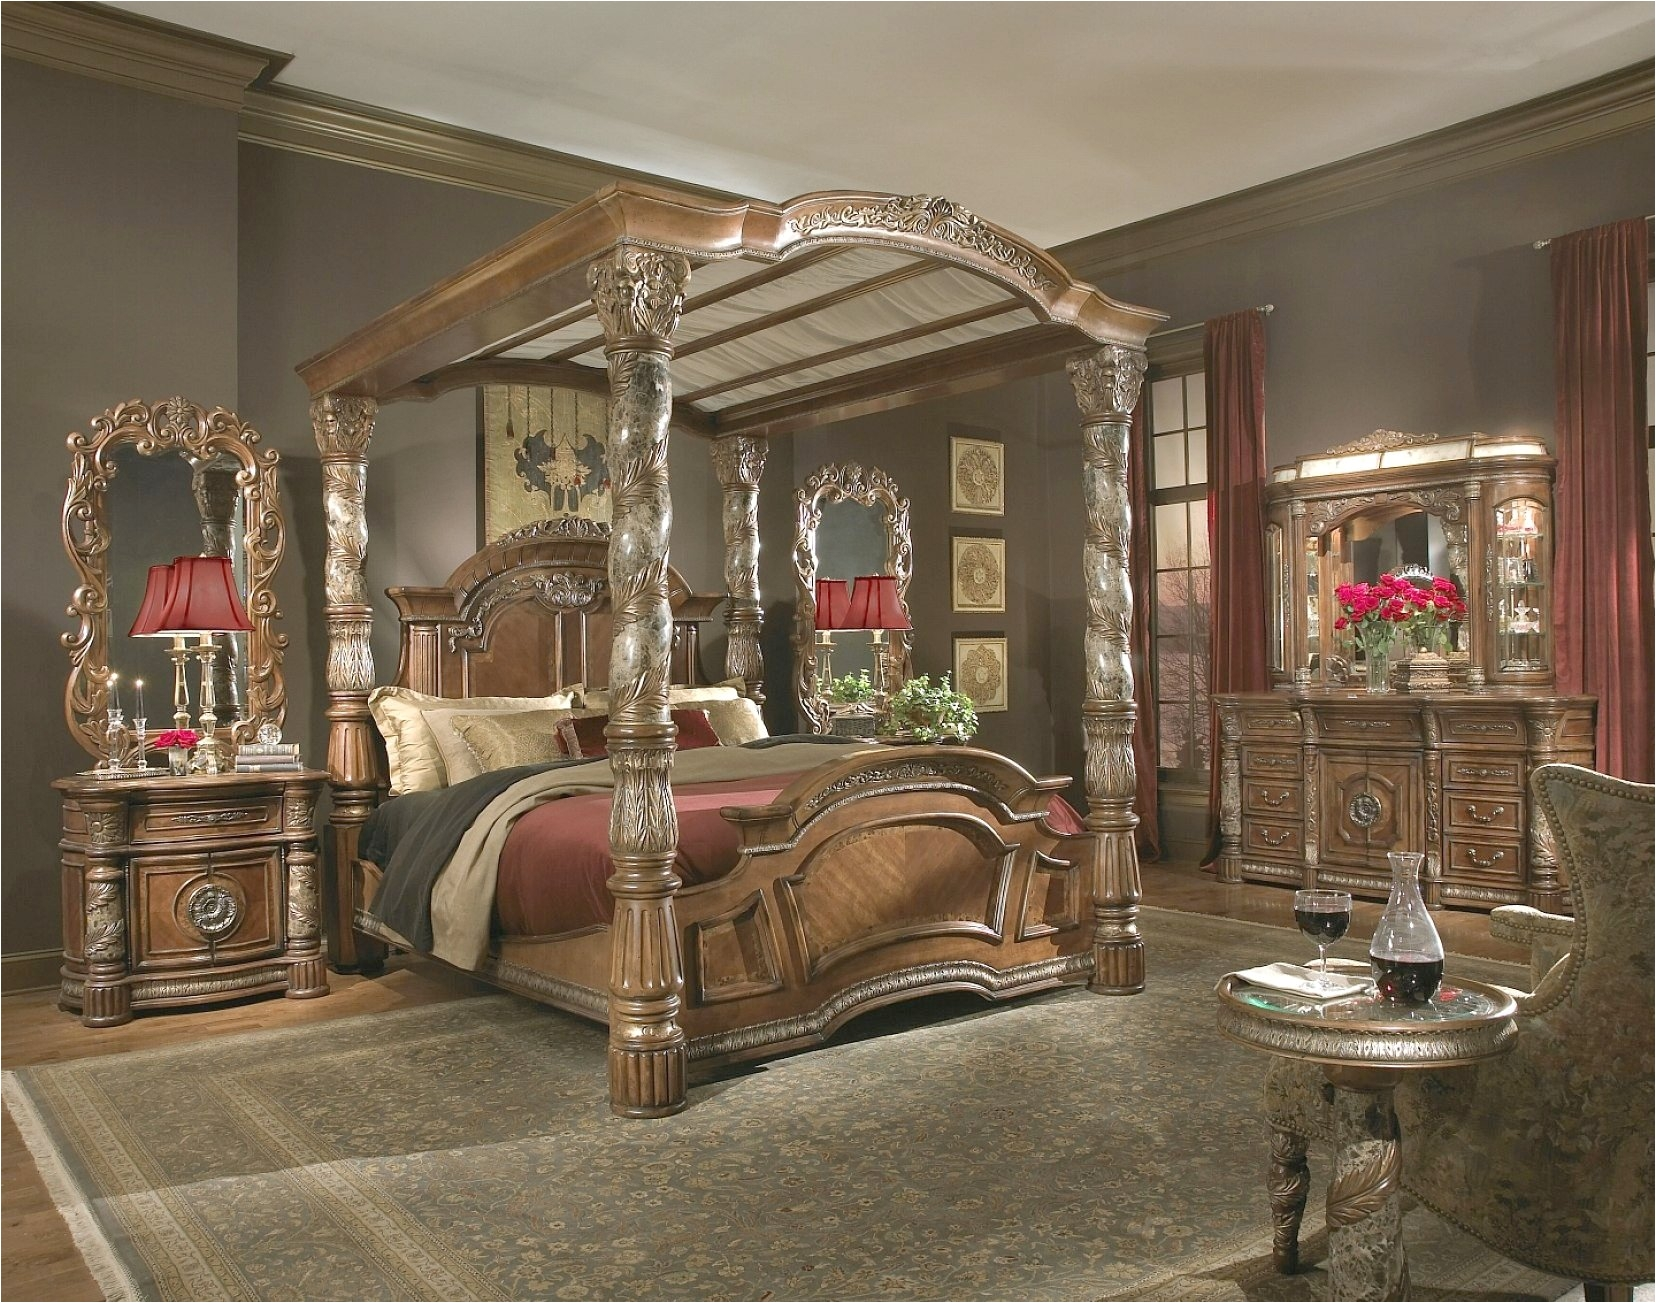 lacks furniture gallery beautiful lacks bedroom furniture gallery decorating ideas within lacks furniture galleria